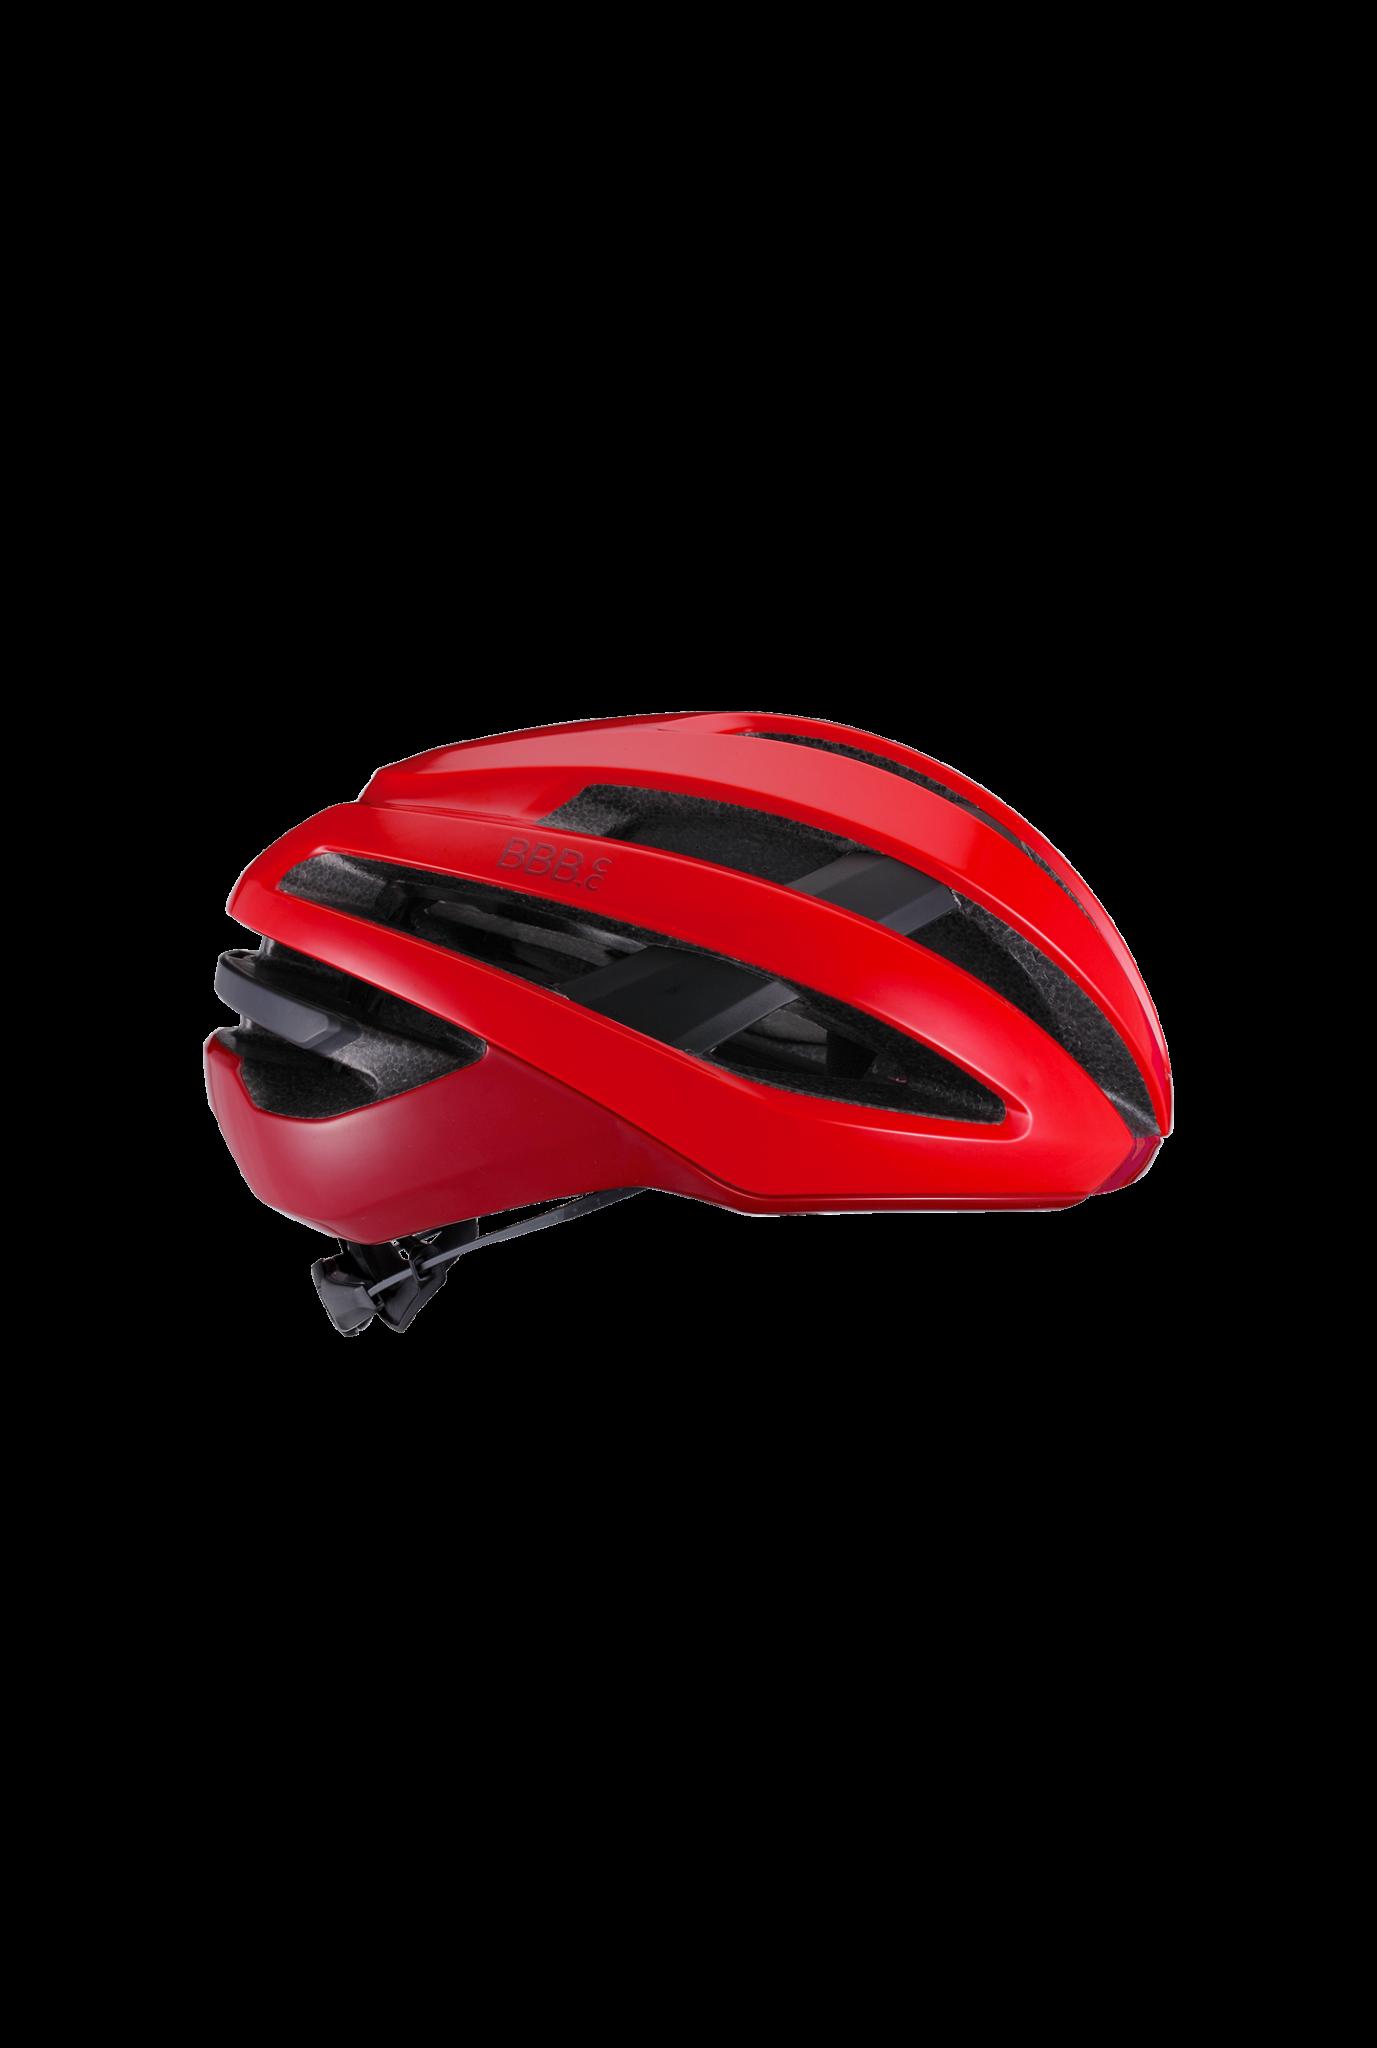 Helm Maestro glossy rood-2